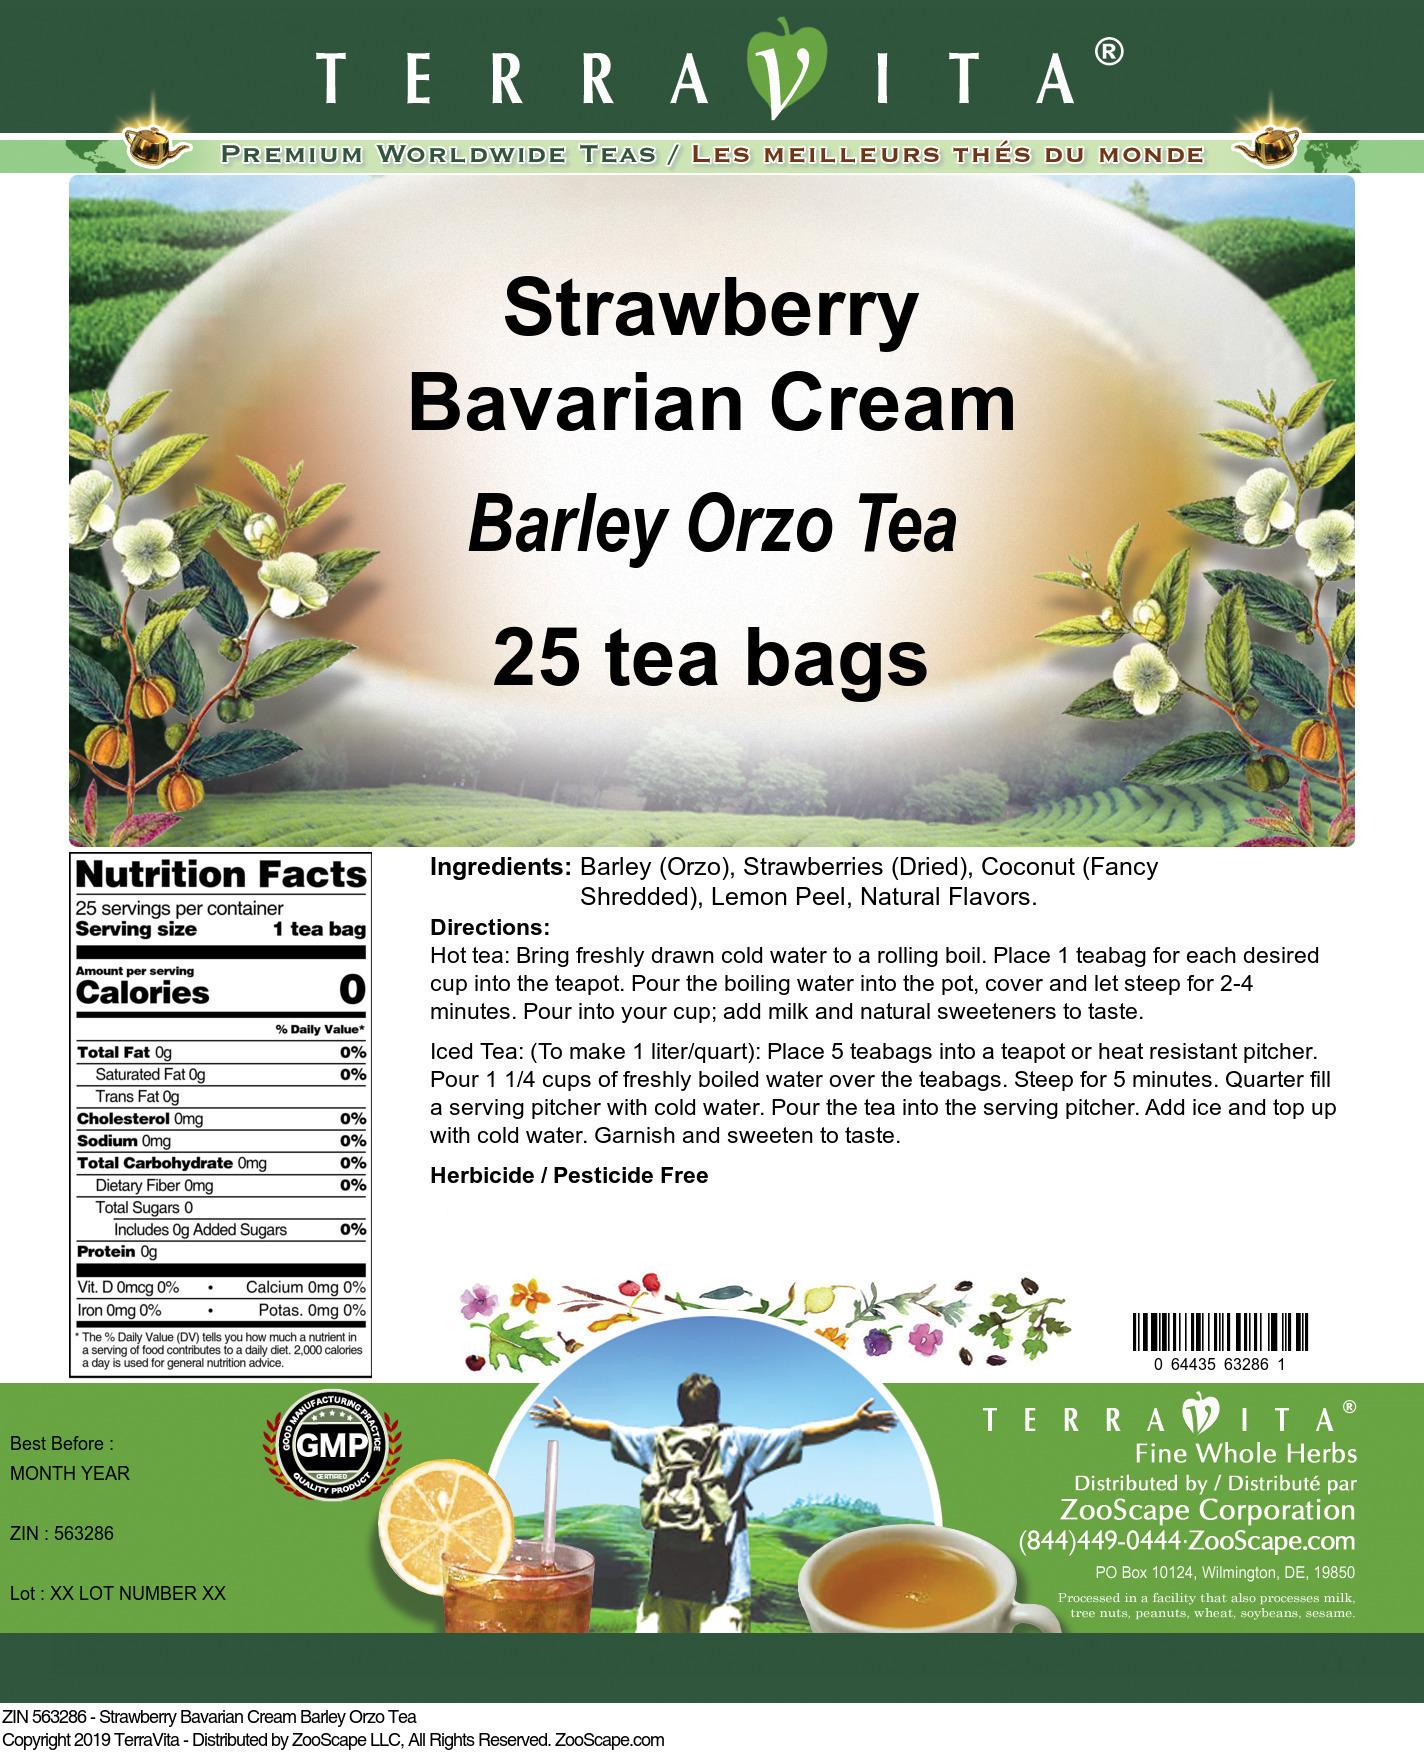 Strawberry Bavarian Cream Barley Orzo